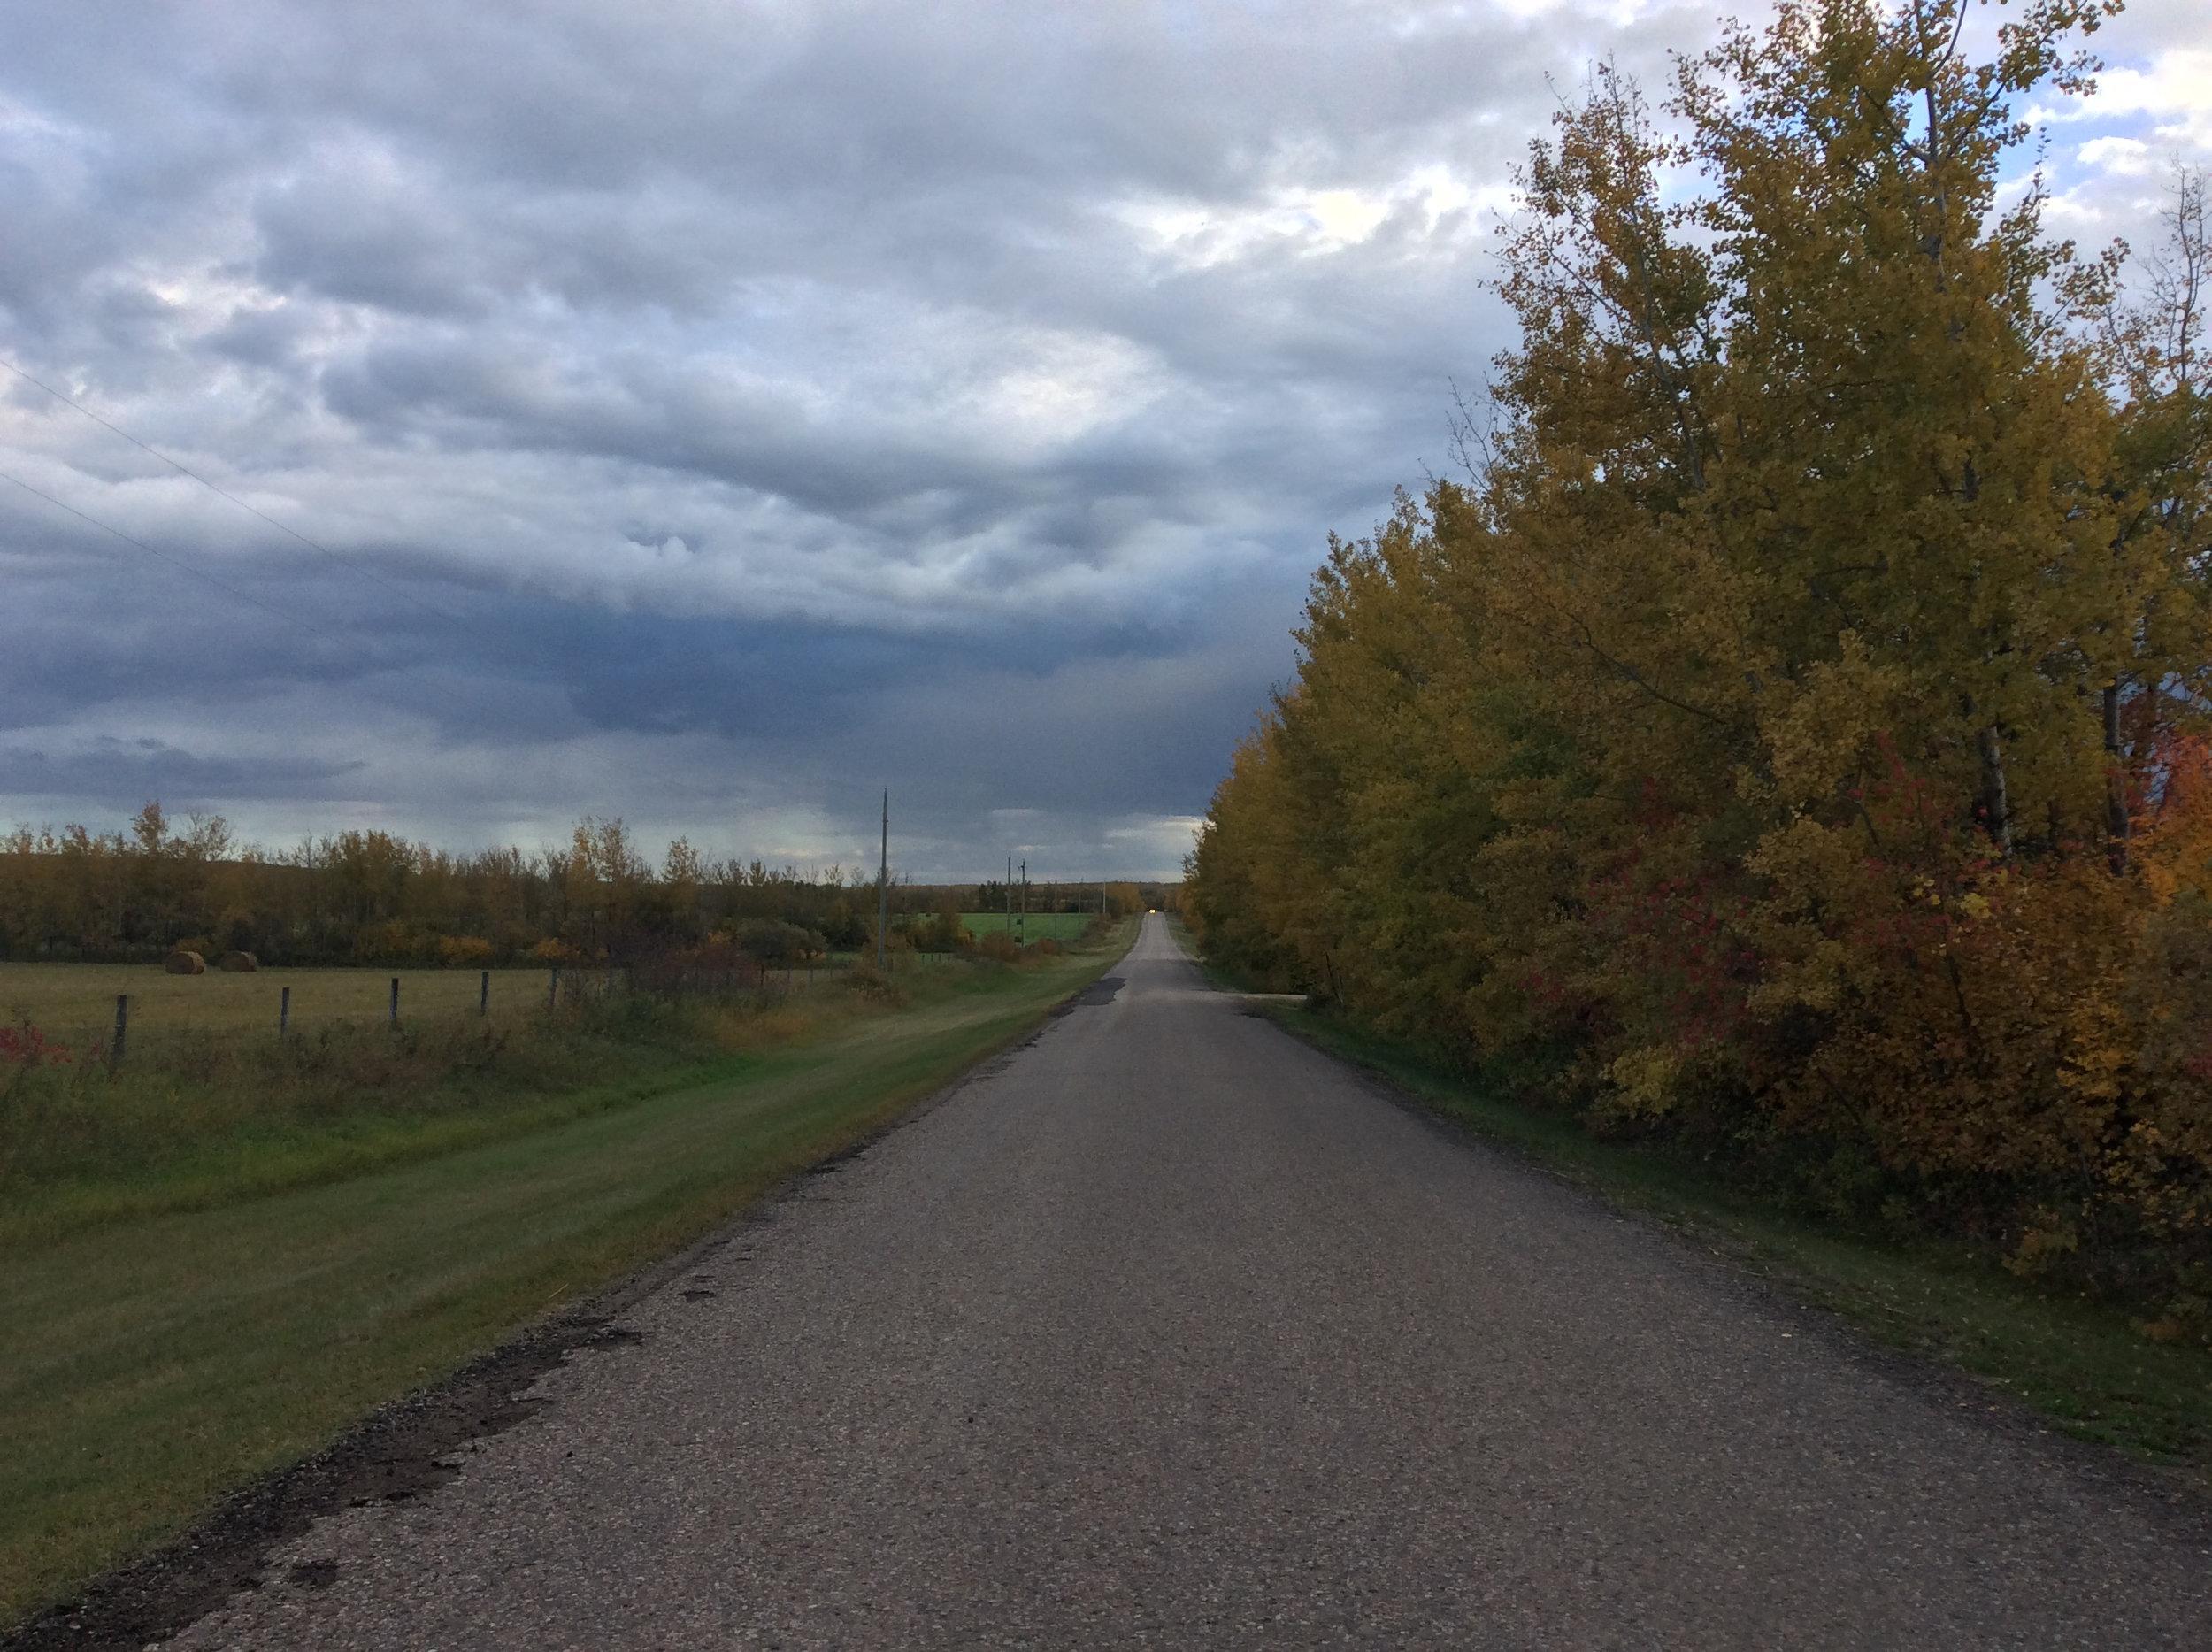 Looking south on the road near E-Tree Farm (Range Rd 414)